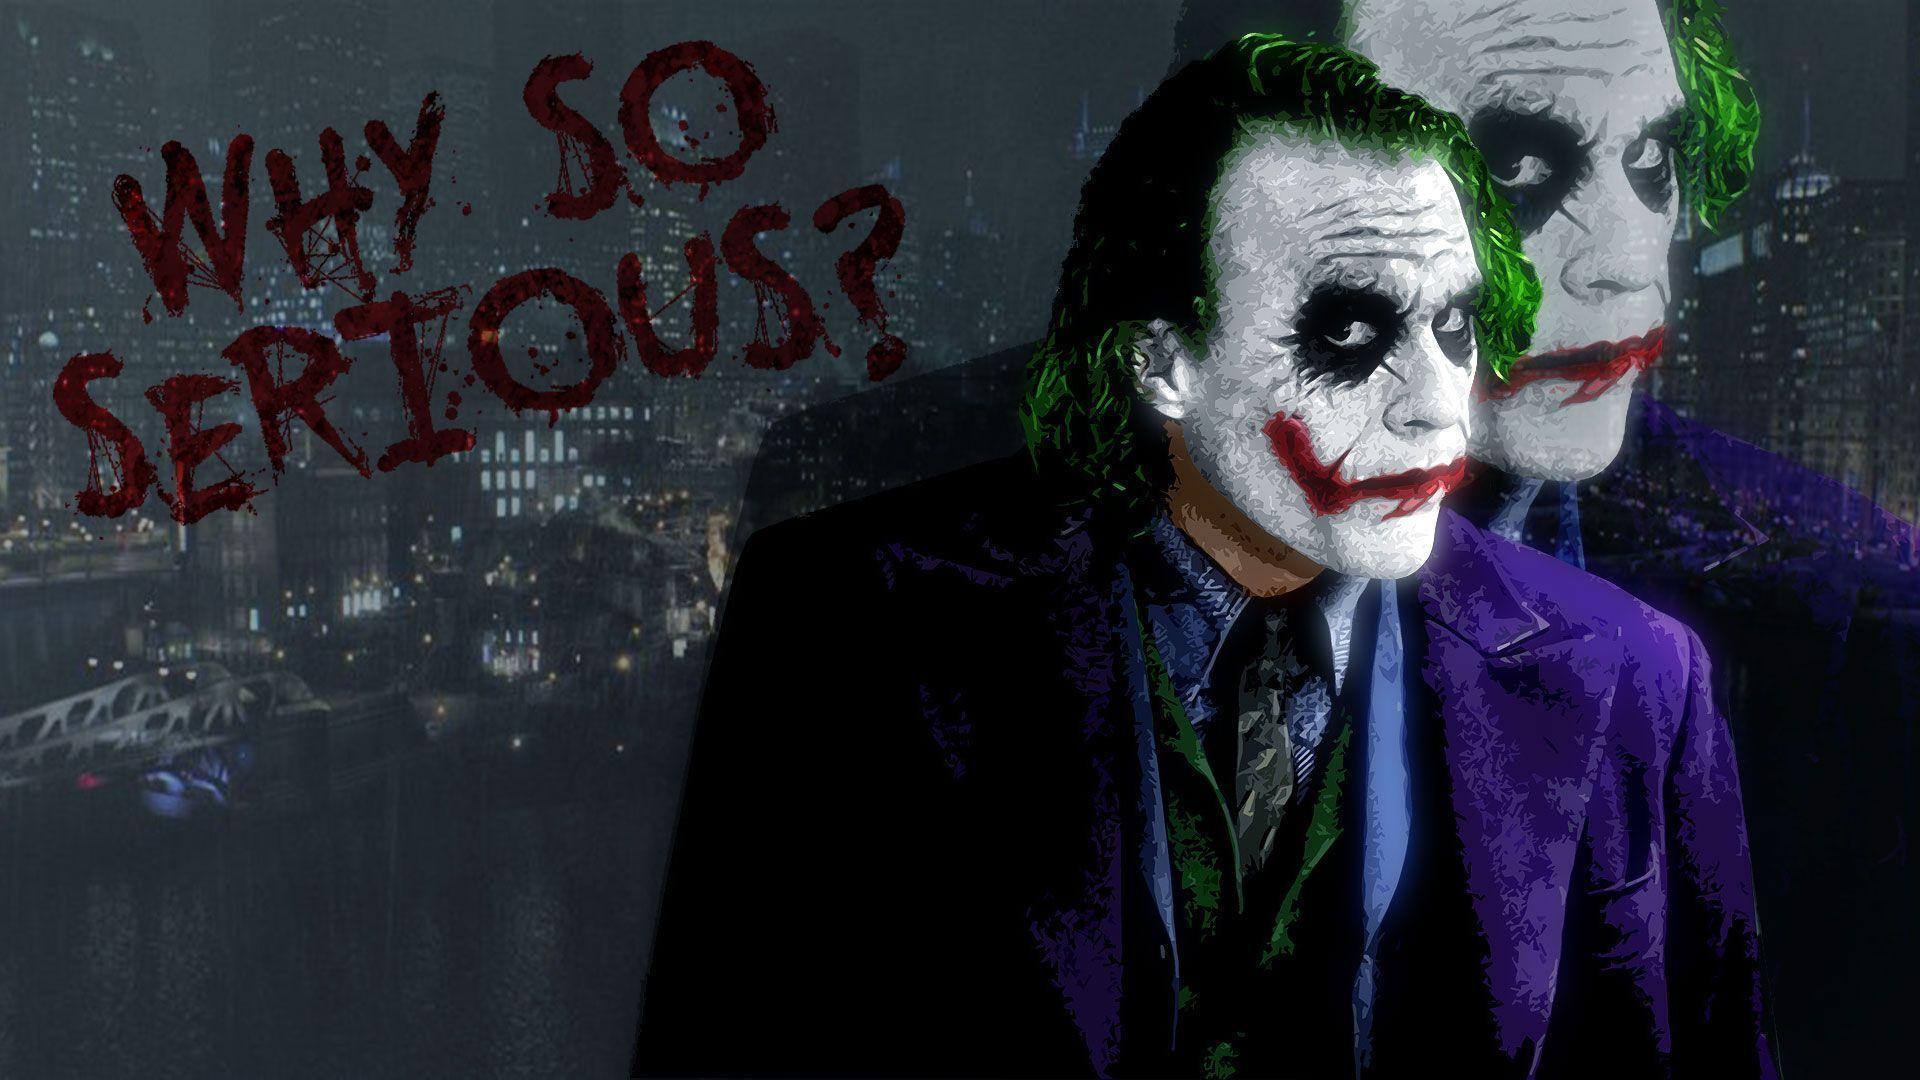 joker wallpaper pc - photo #34